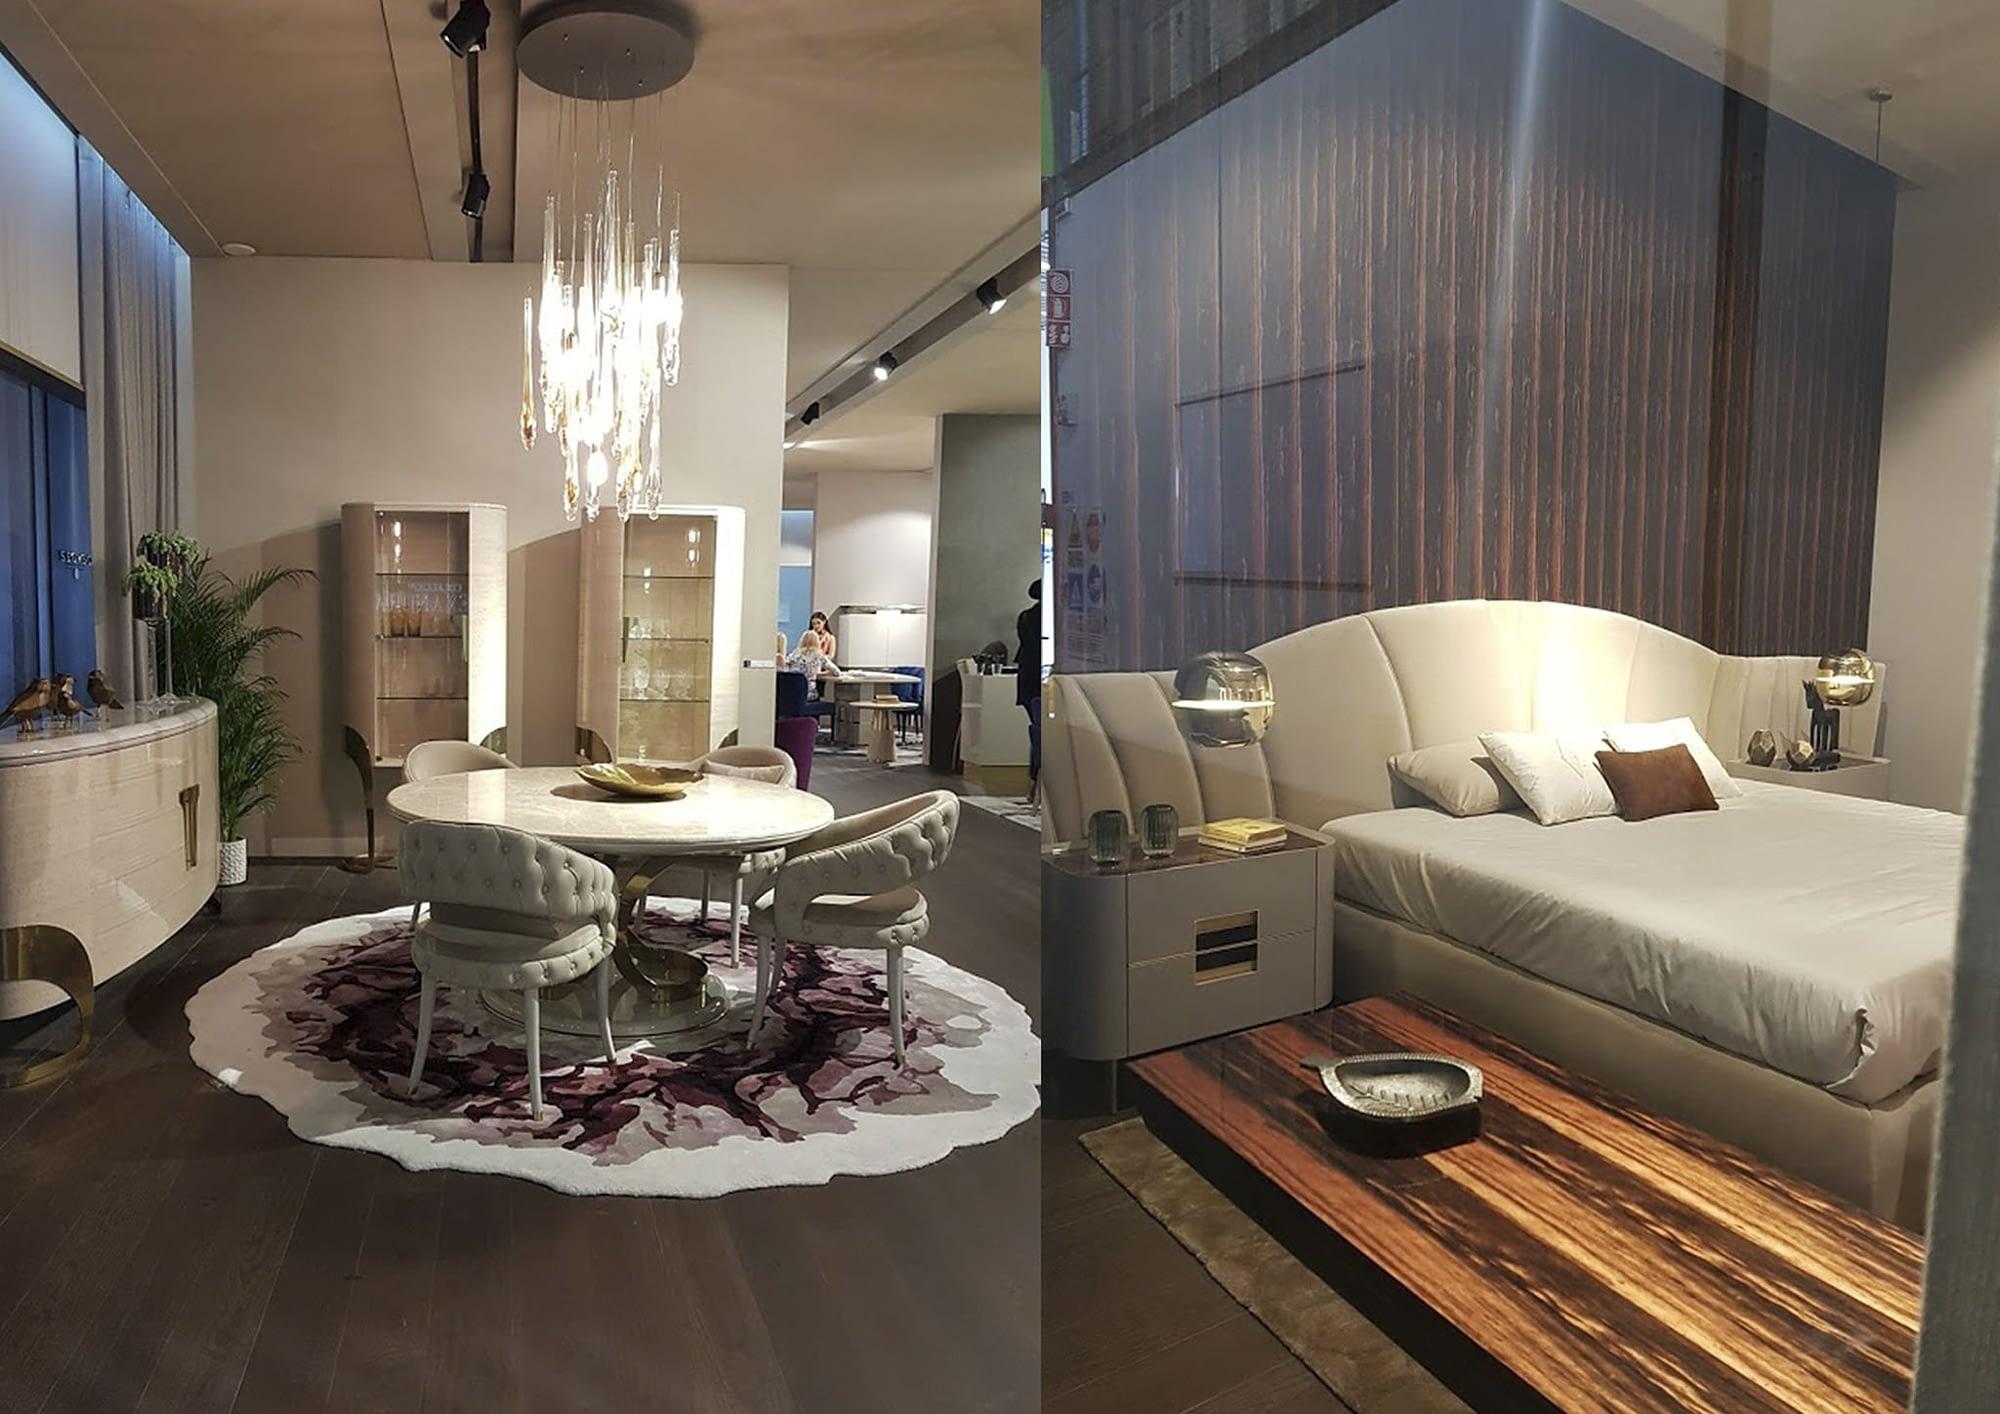 Milano Design Week 2018 - Salone del Mobile 84